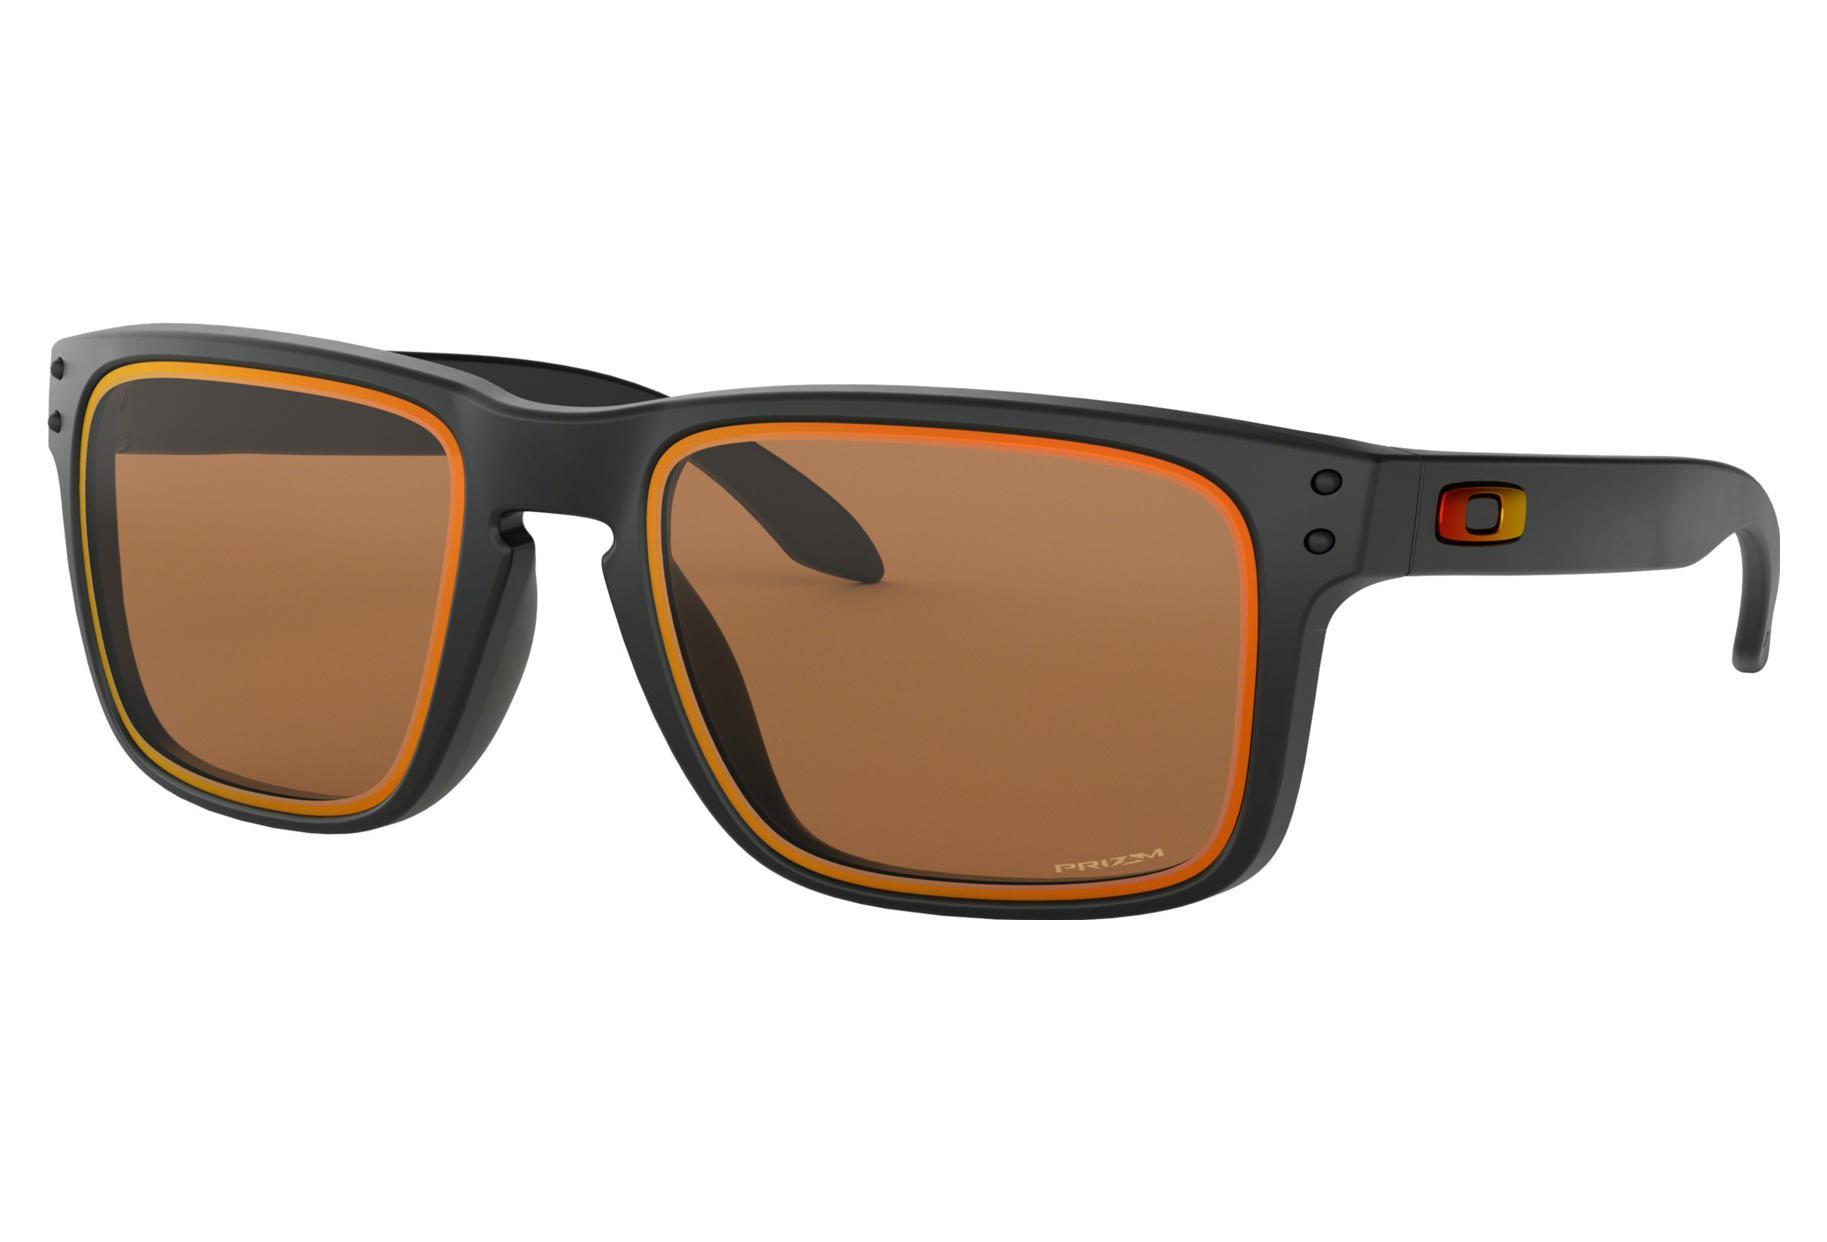 7b9f174fe2 Gafas de sol Oakley Holbrook Fire and Ice Colección Matte Black ...